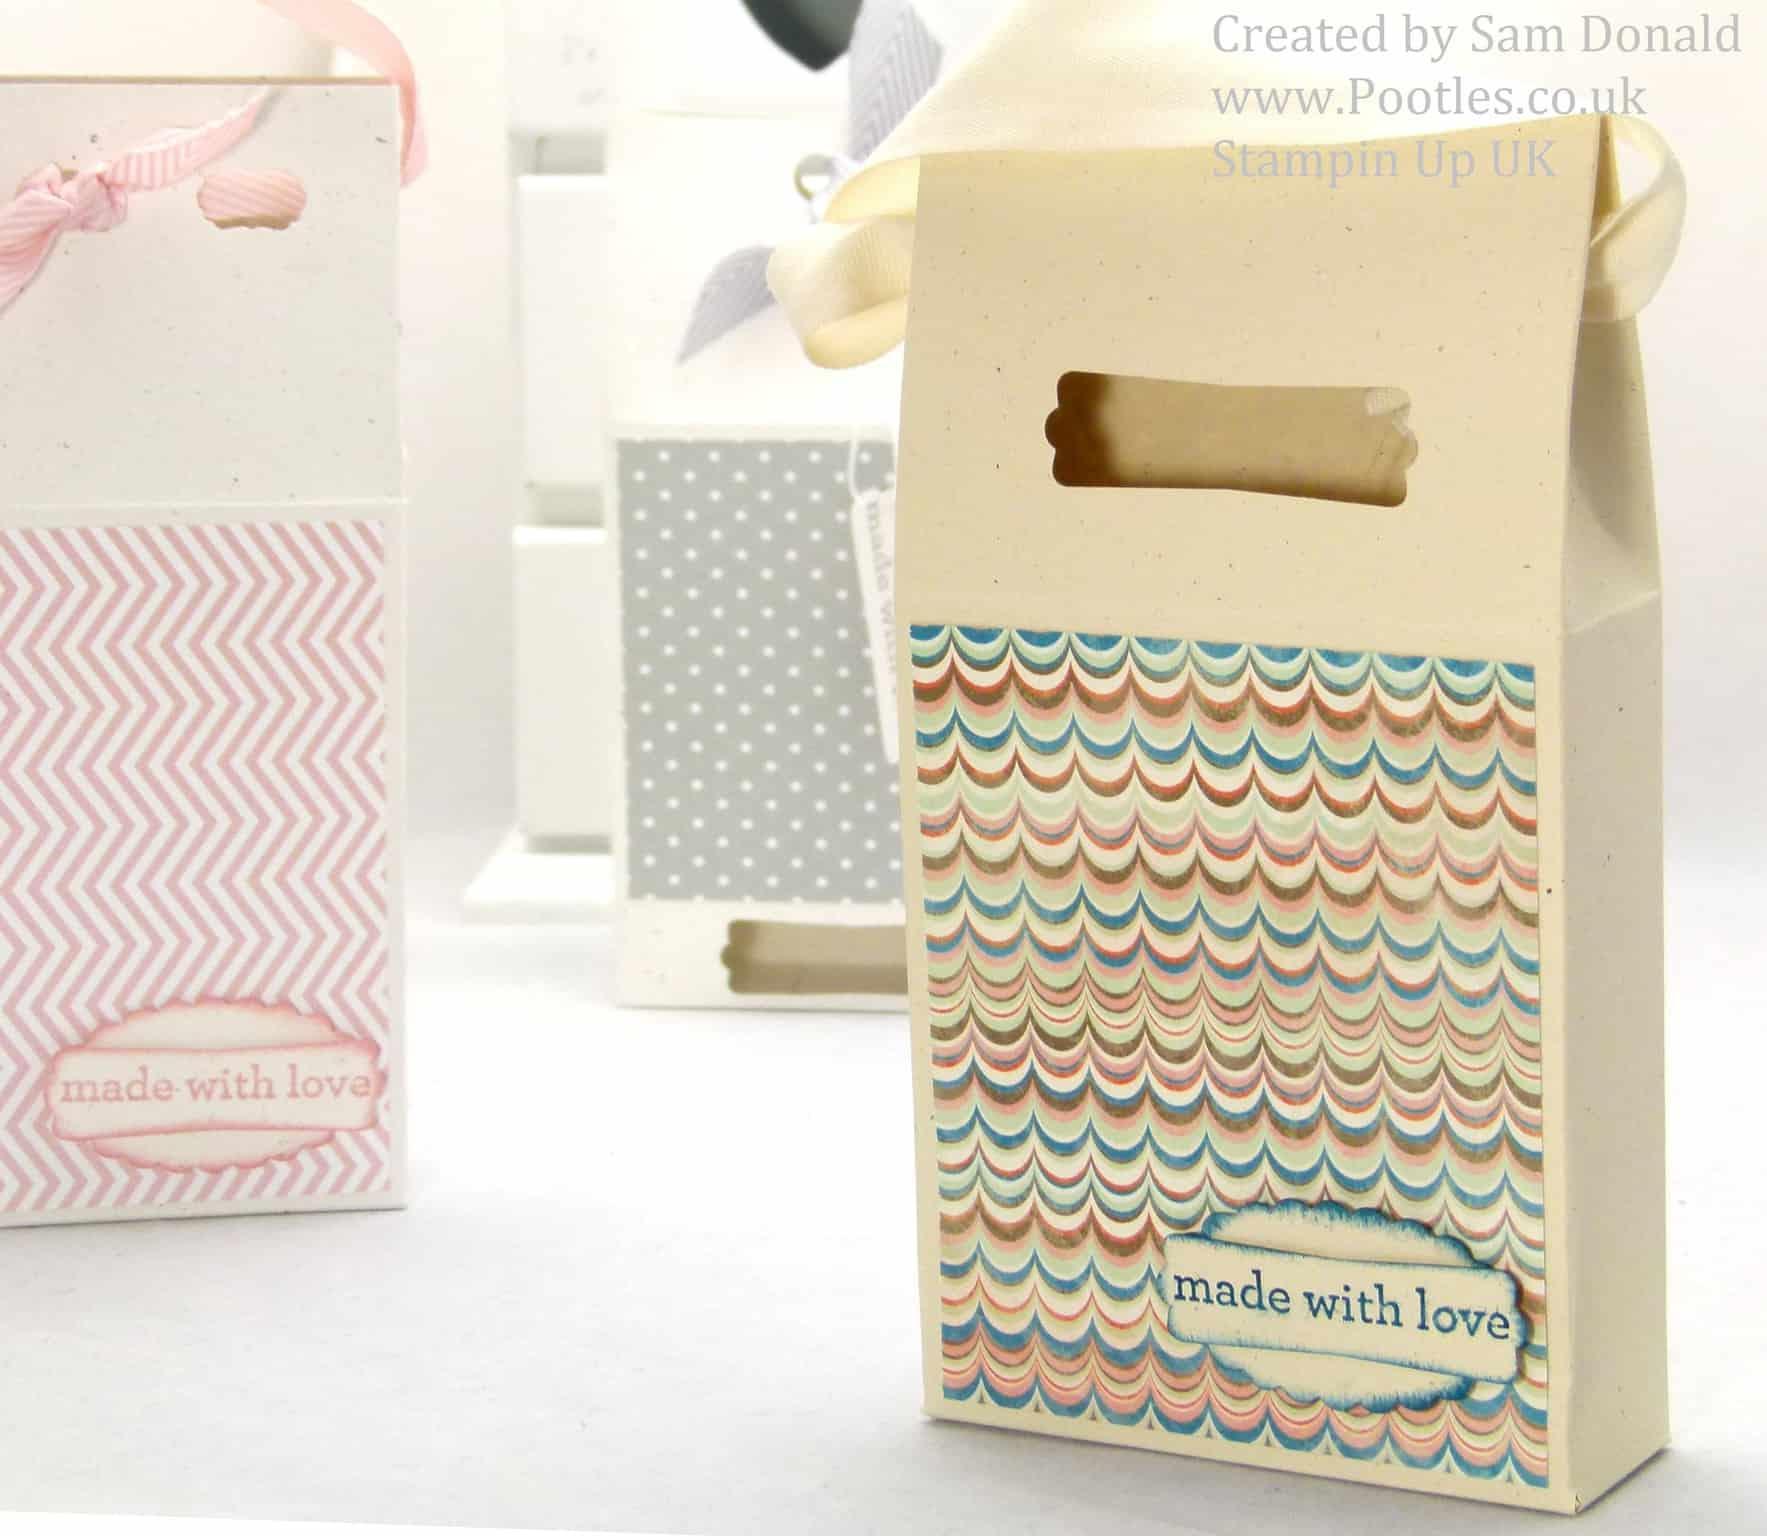 Pootles Stampin Up UK Soap Treat Box 2 (2)